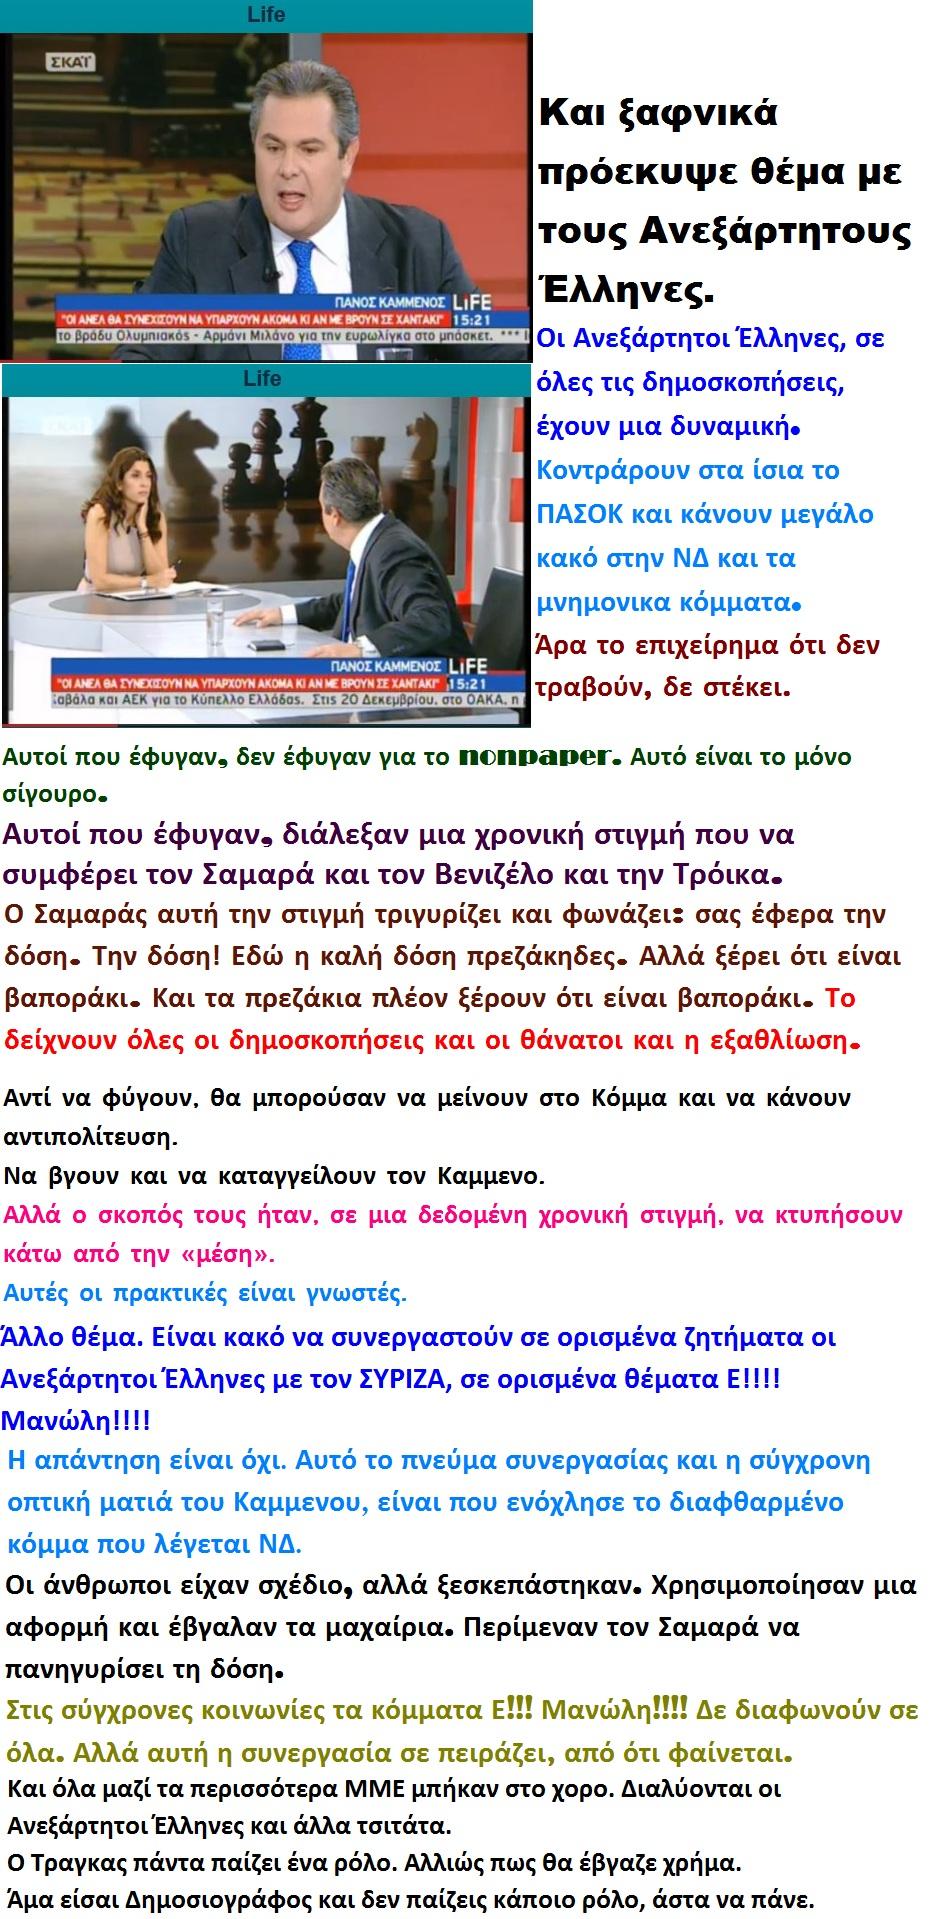 ELLADA KAMMENOS ANKSARTHTOI ELLHNES 01 141212